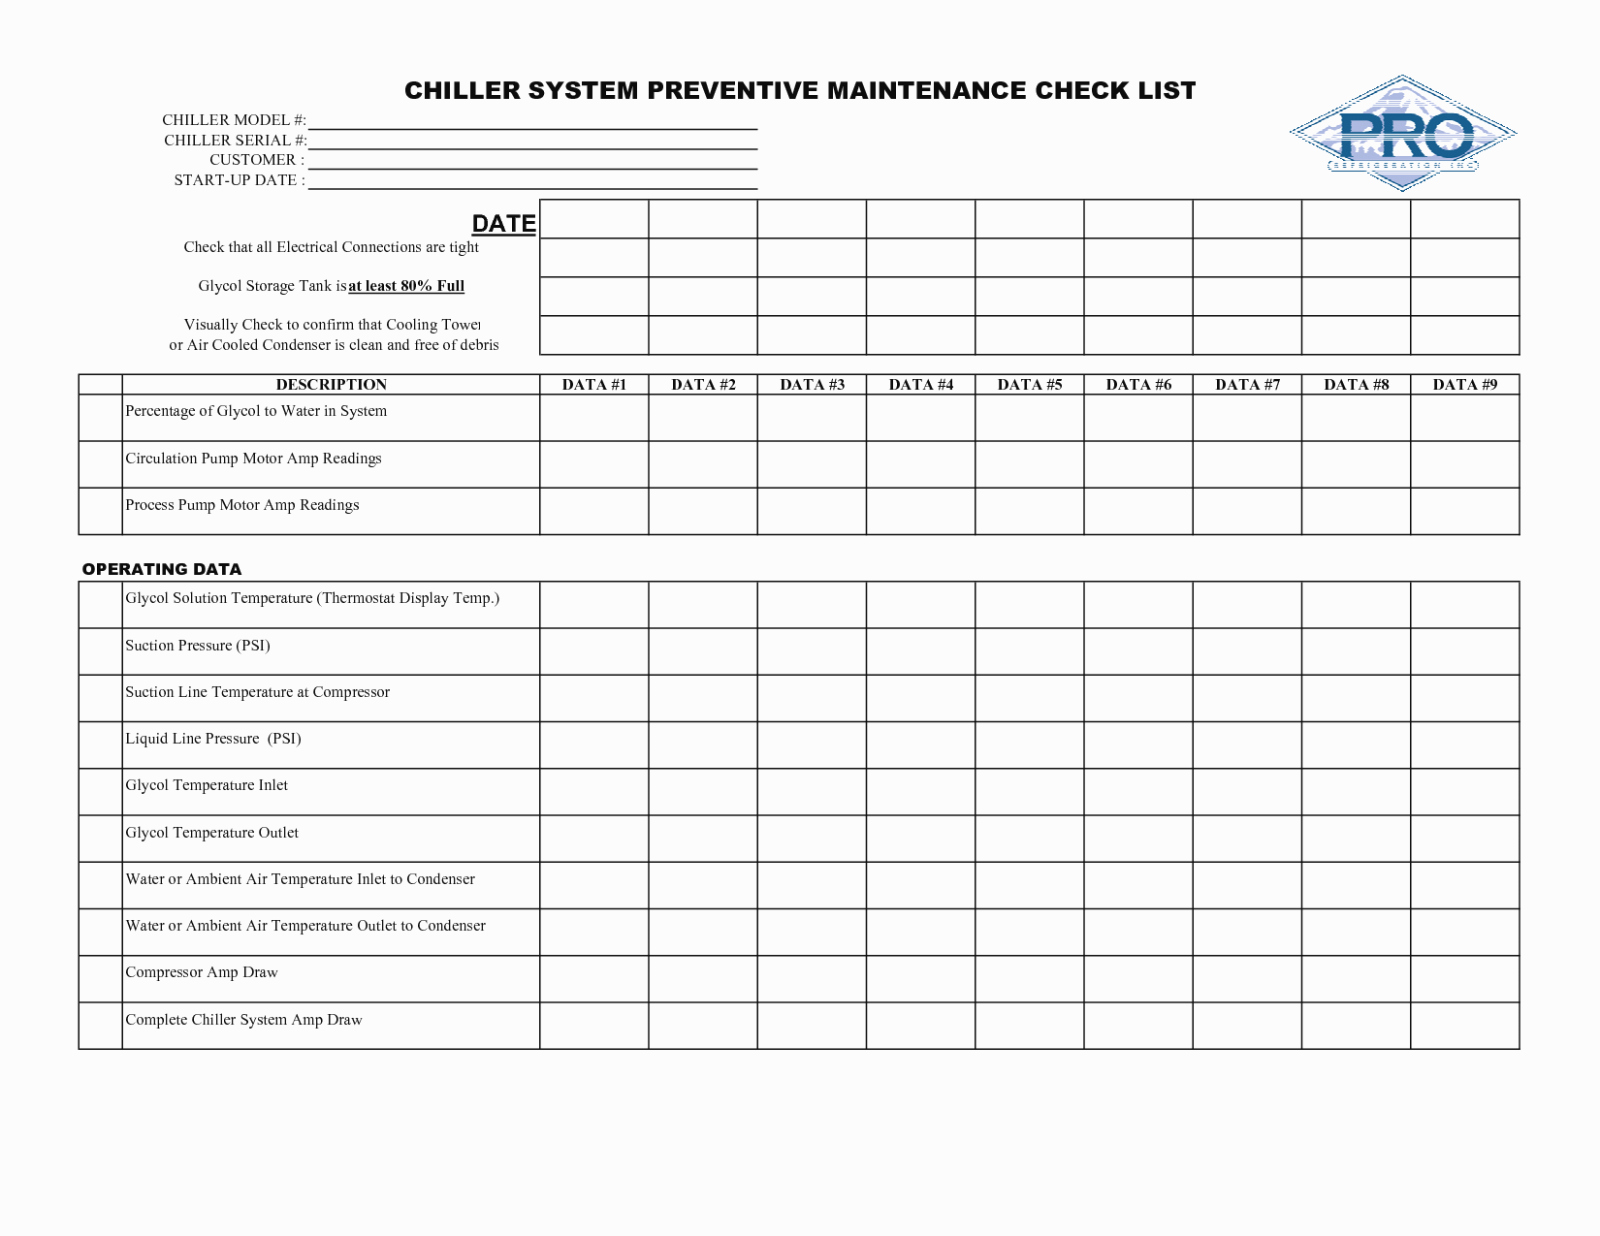 Preventive Maintenance Checklist Template Awesome Best S Of Facility Preventive Maintenance Checklist